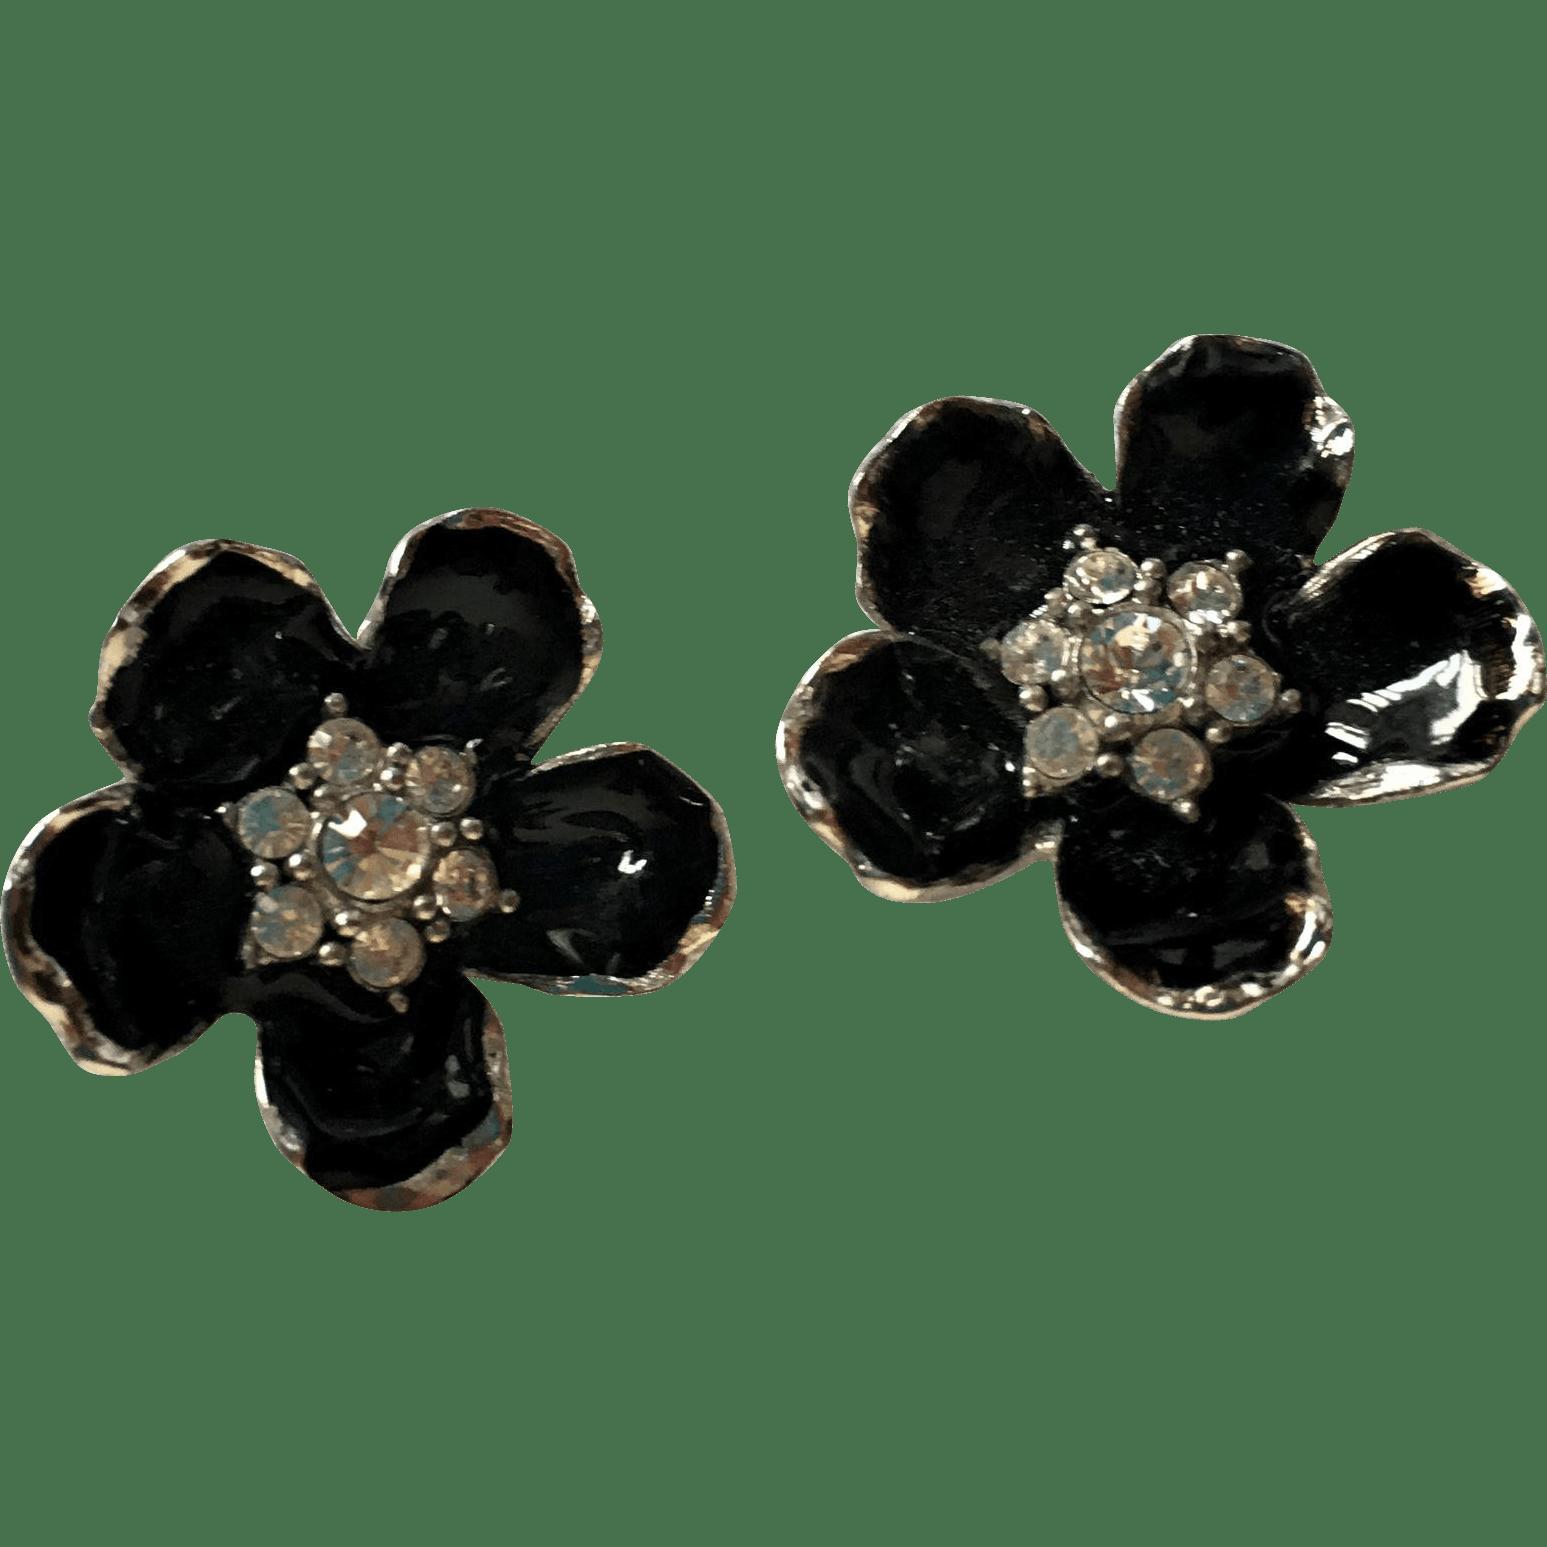 Erwin Pearl Black Enamel and Rhinestone Clip Earrings from